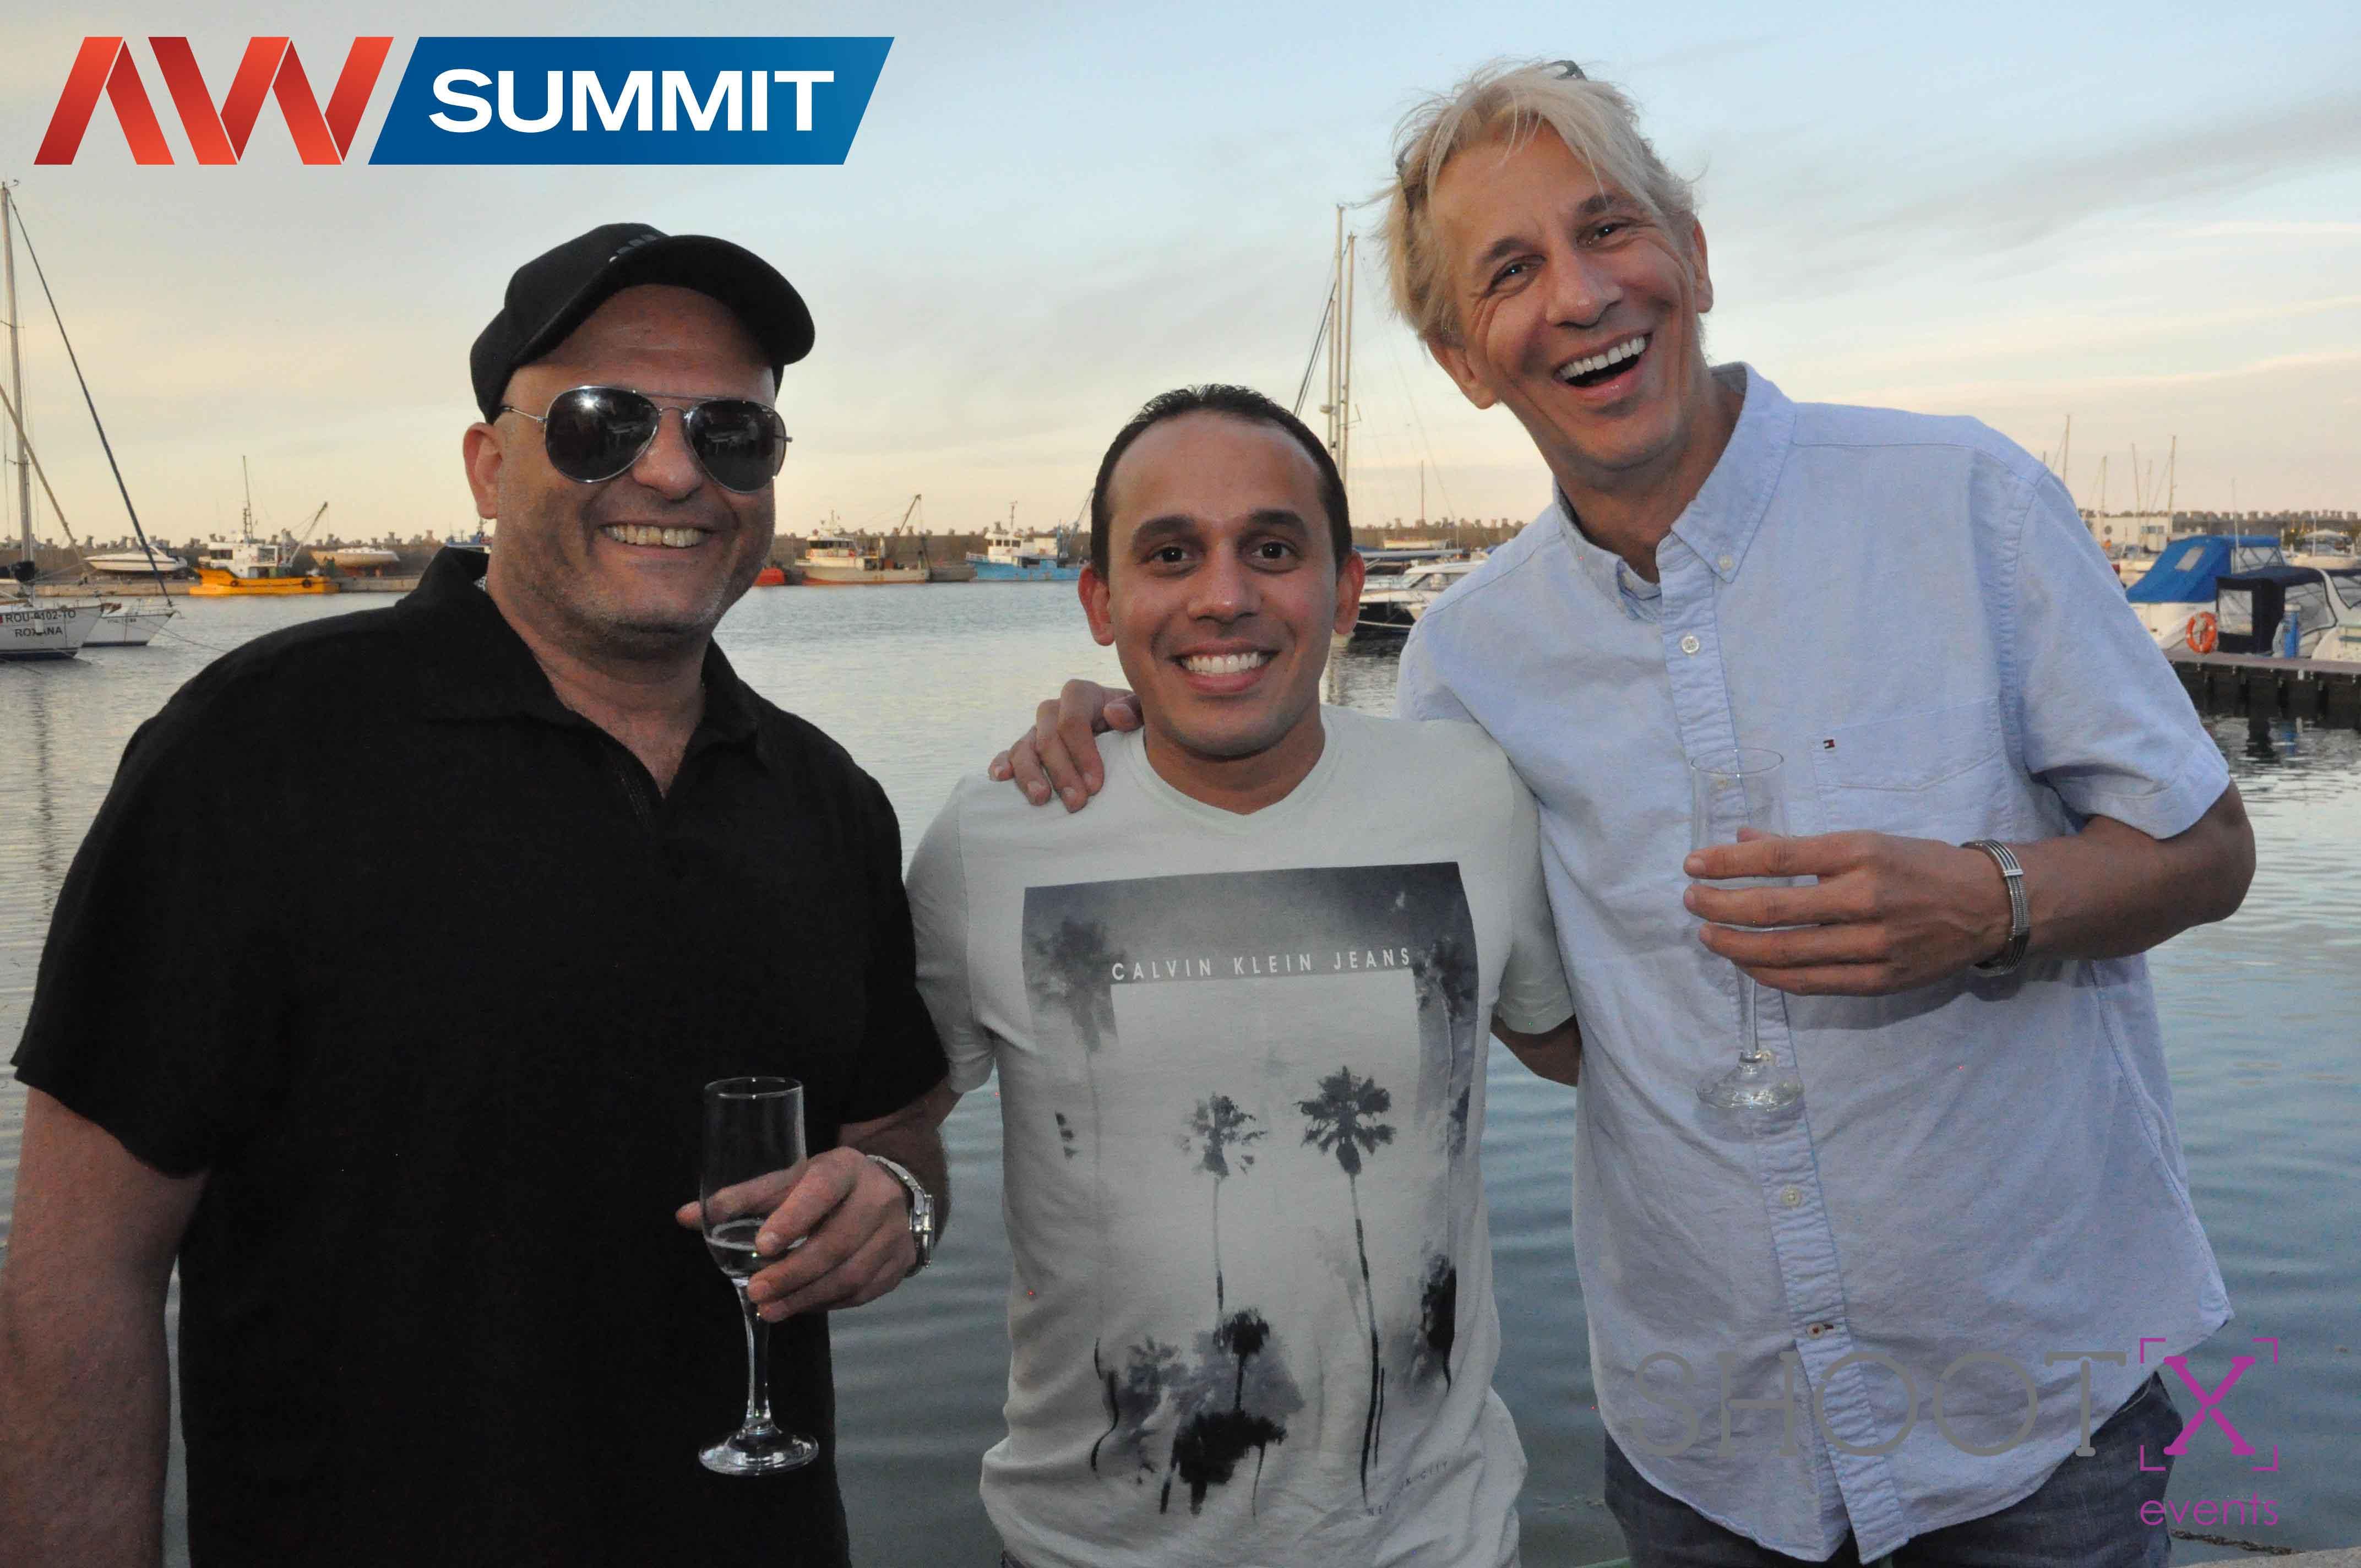 AW Summit 2017